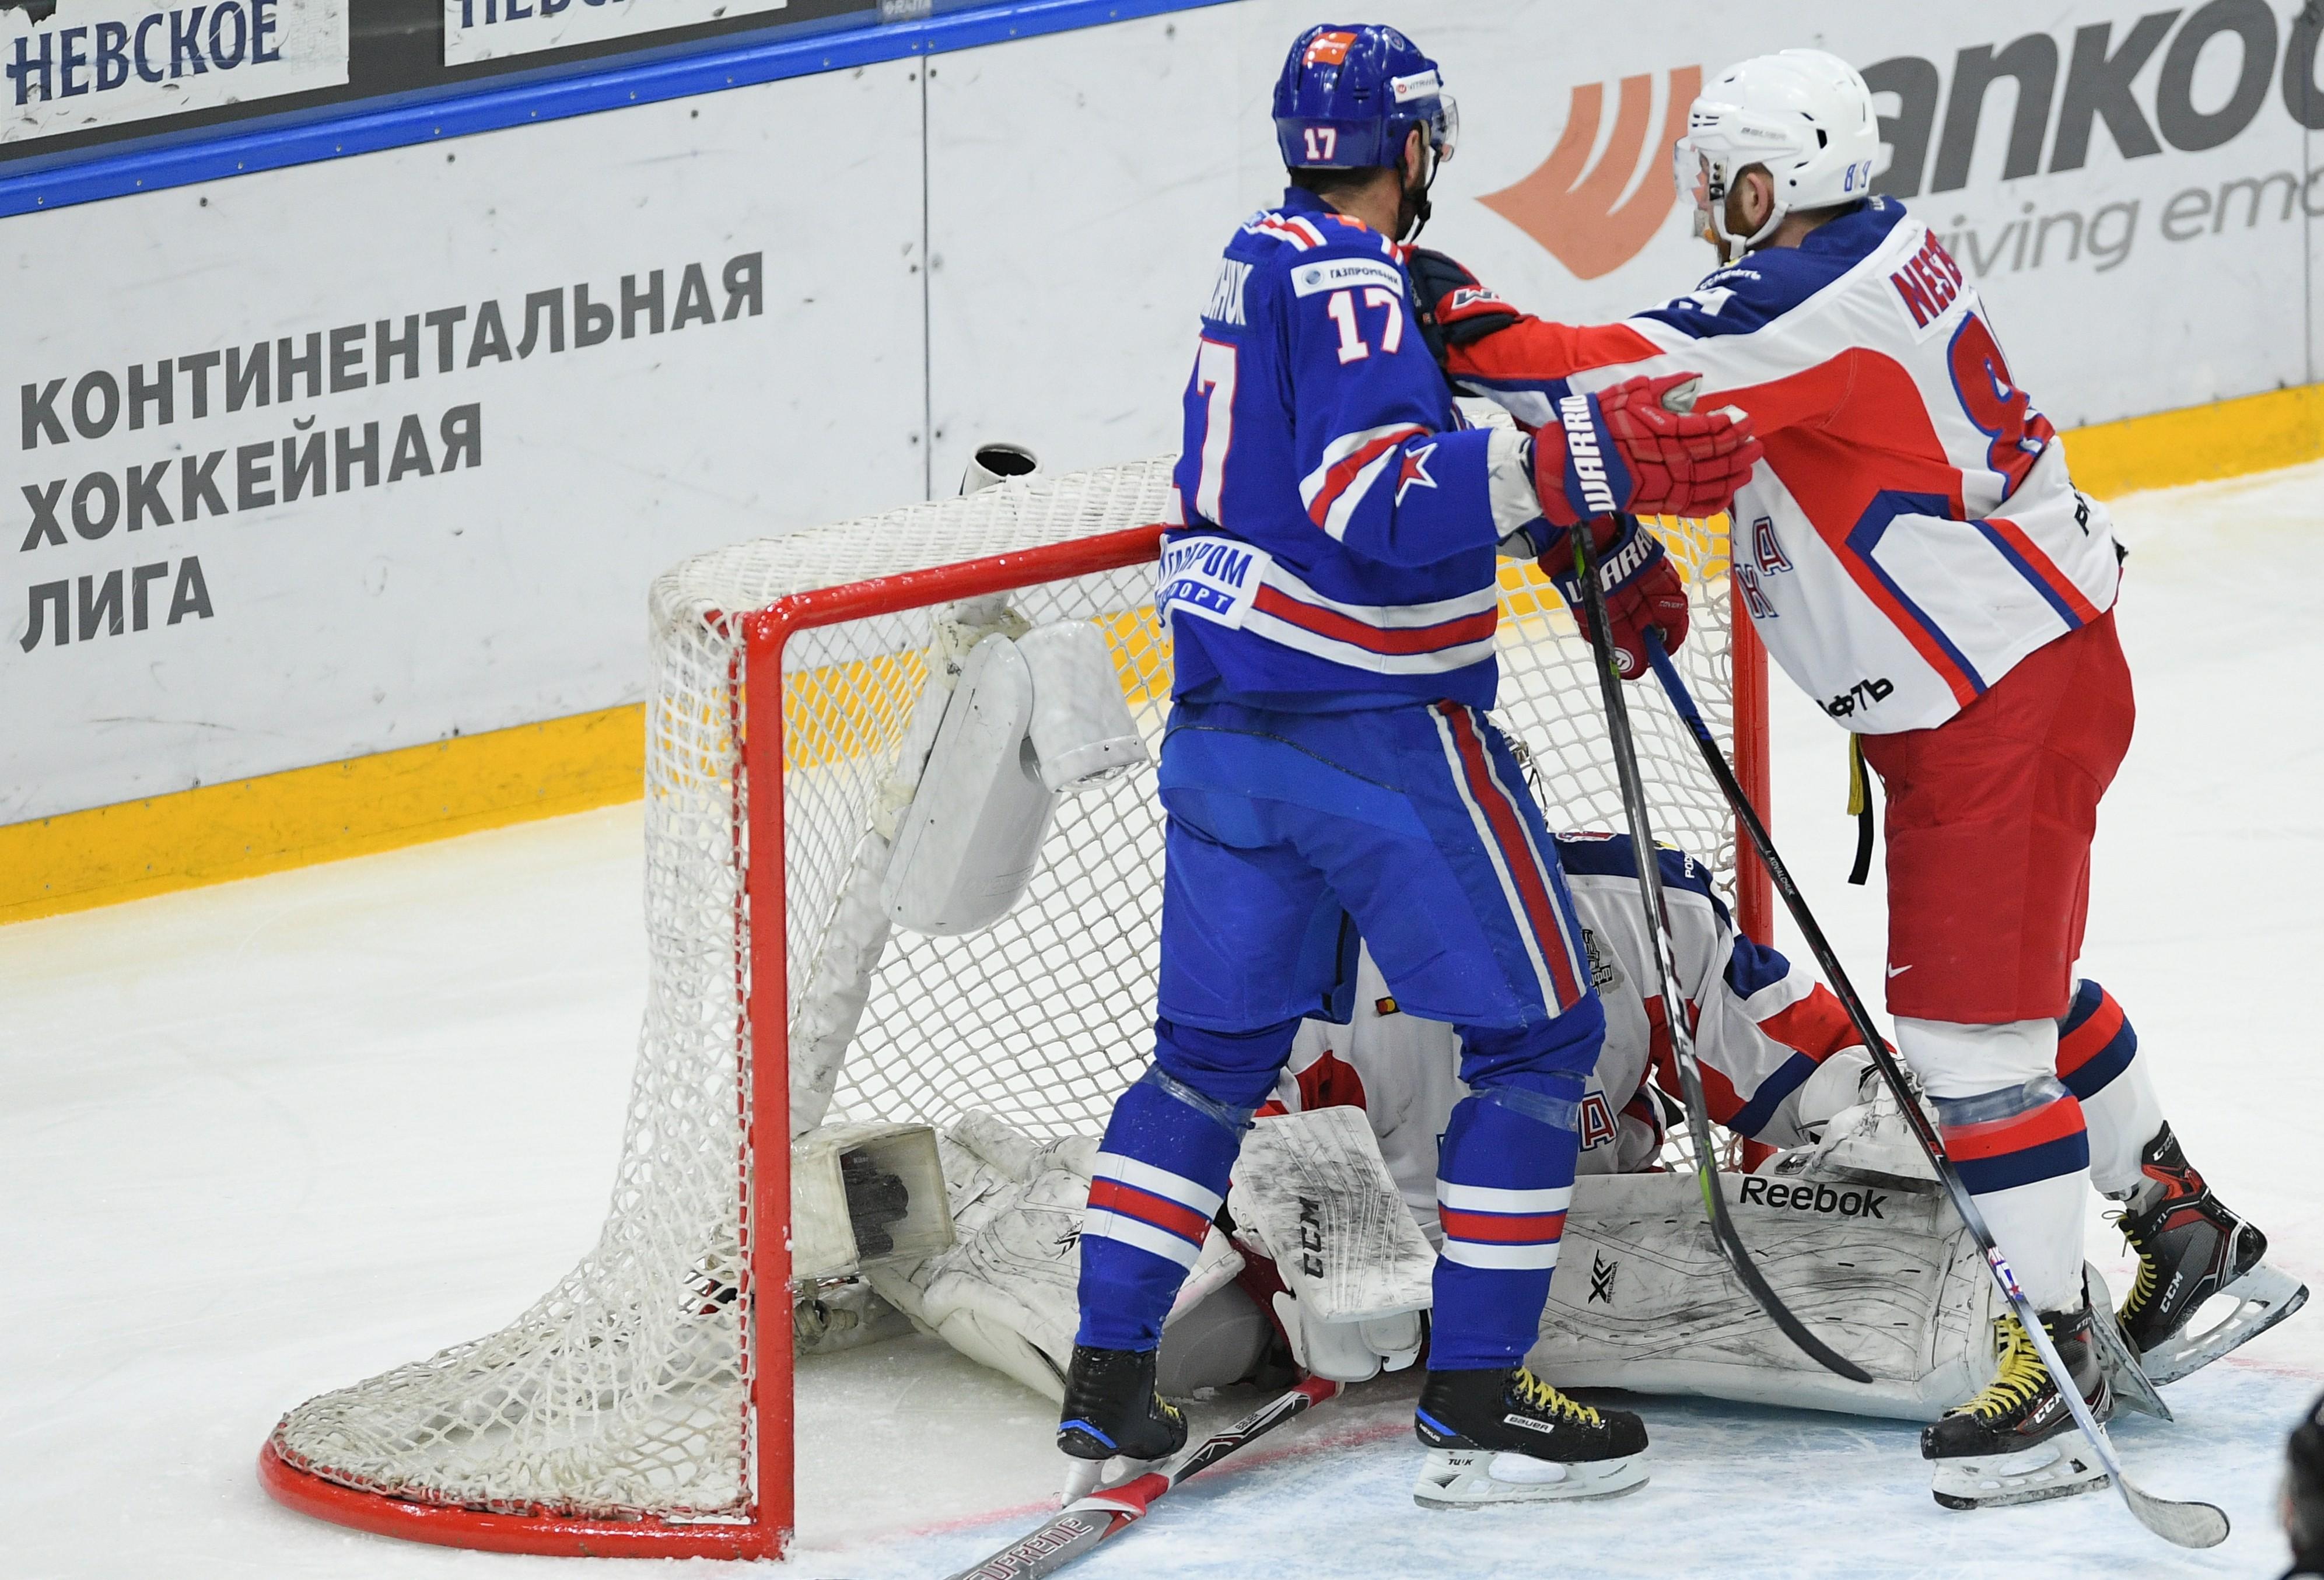 <p>Фото:&nbsp;&copy; РИА Новости/Алексей Даничев</p>